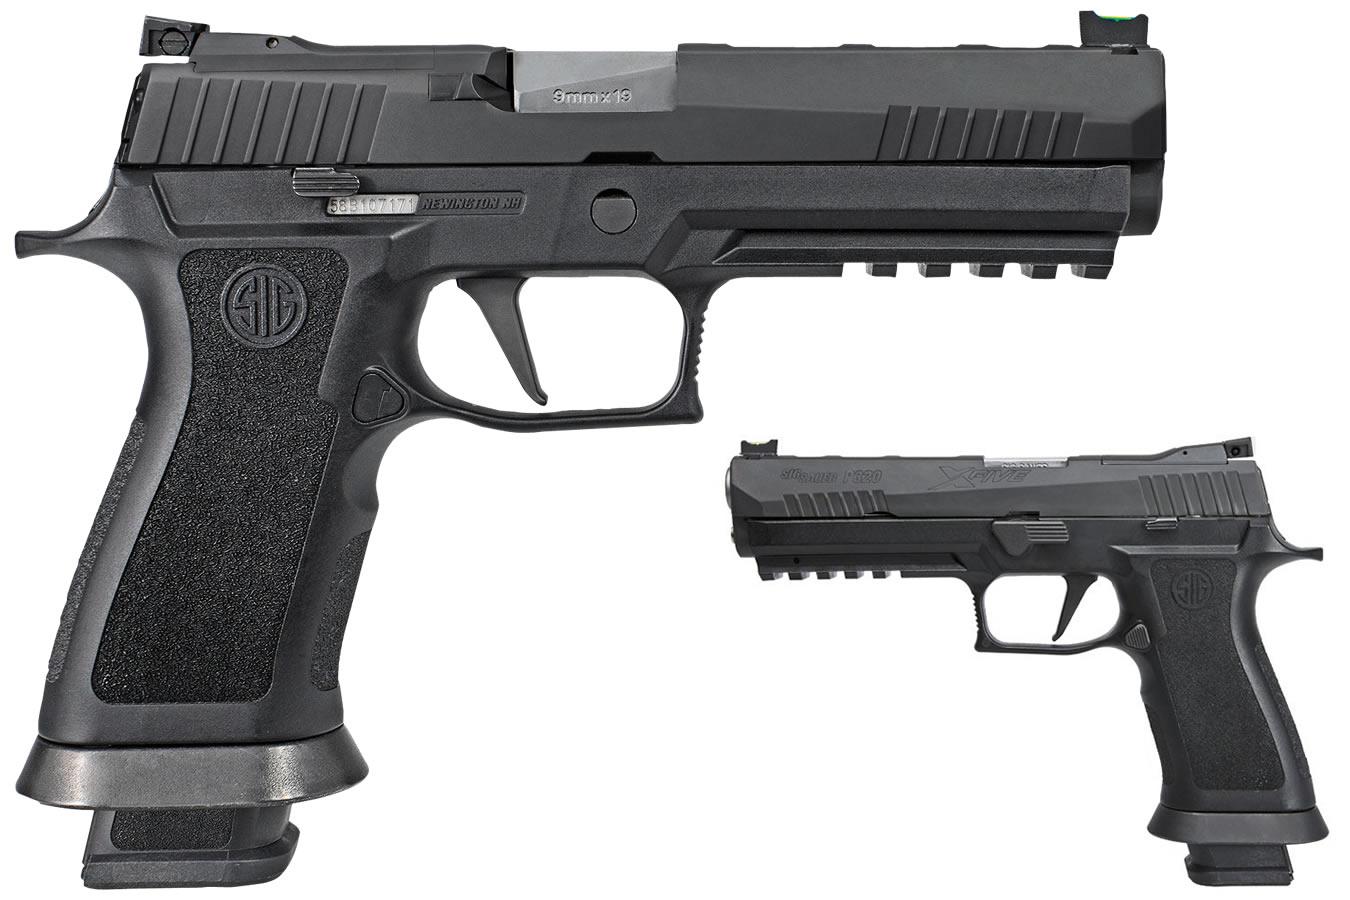 P320 X-Five 9mm Full-Size 21-Round Centerfire Pistol